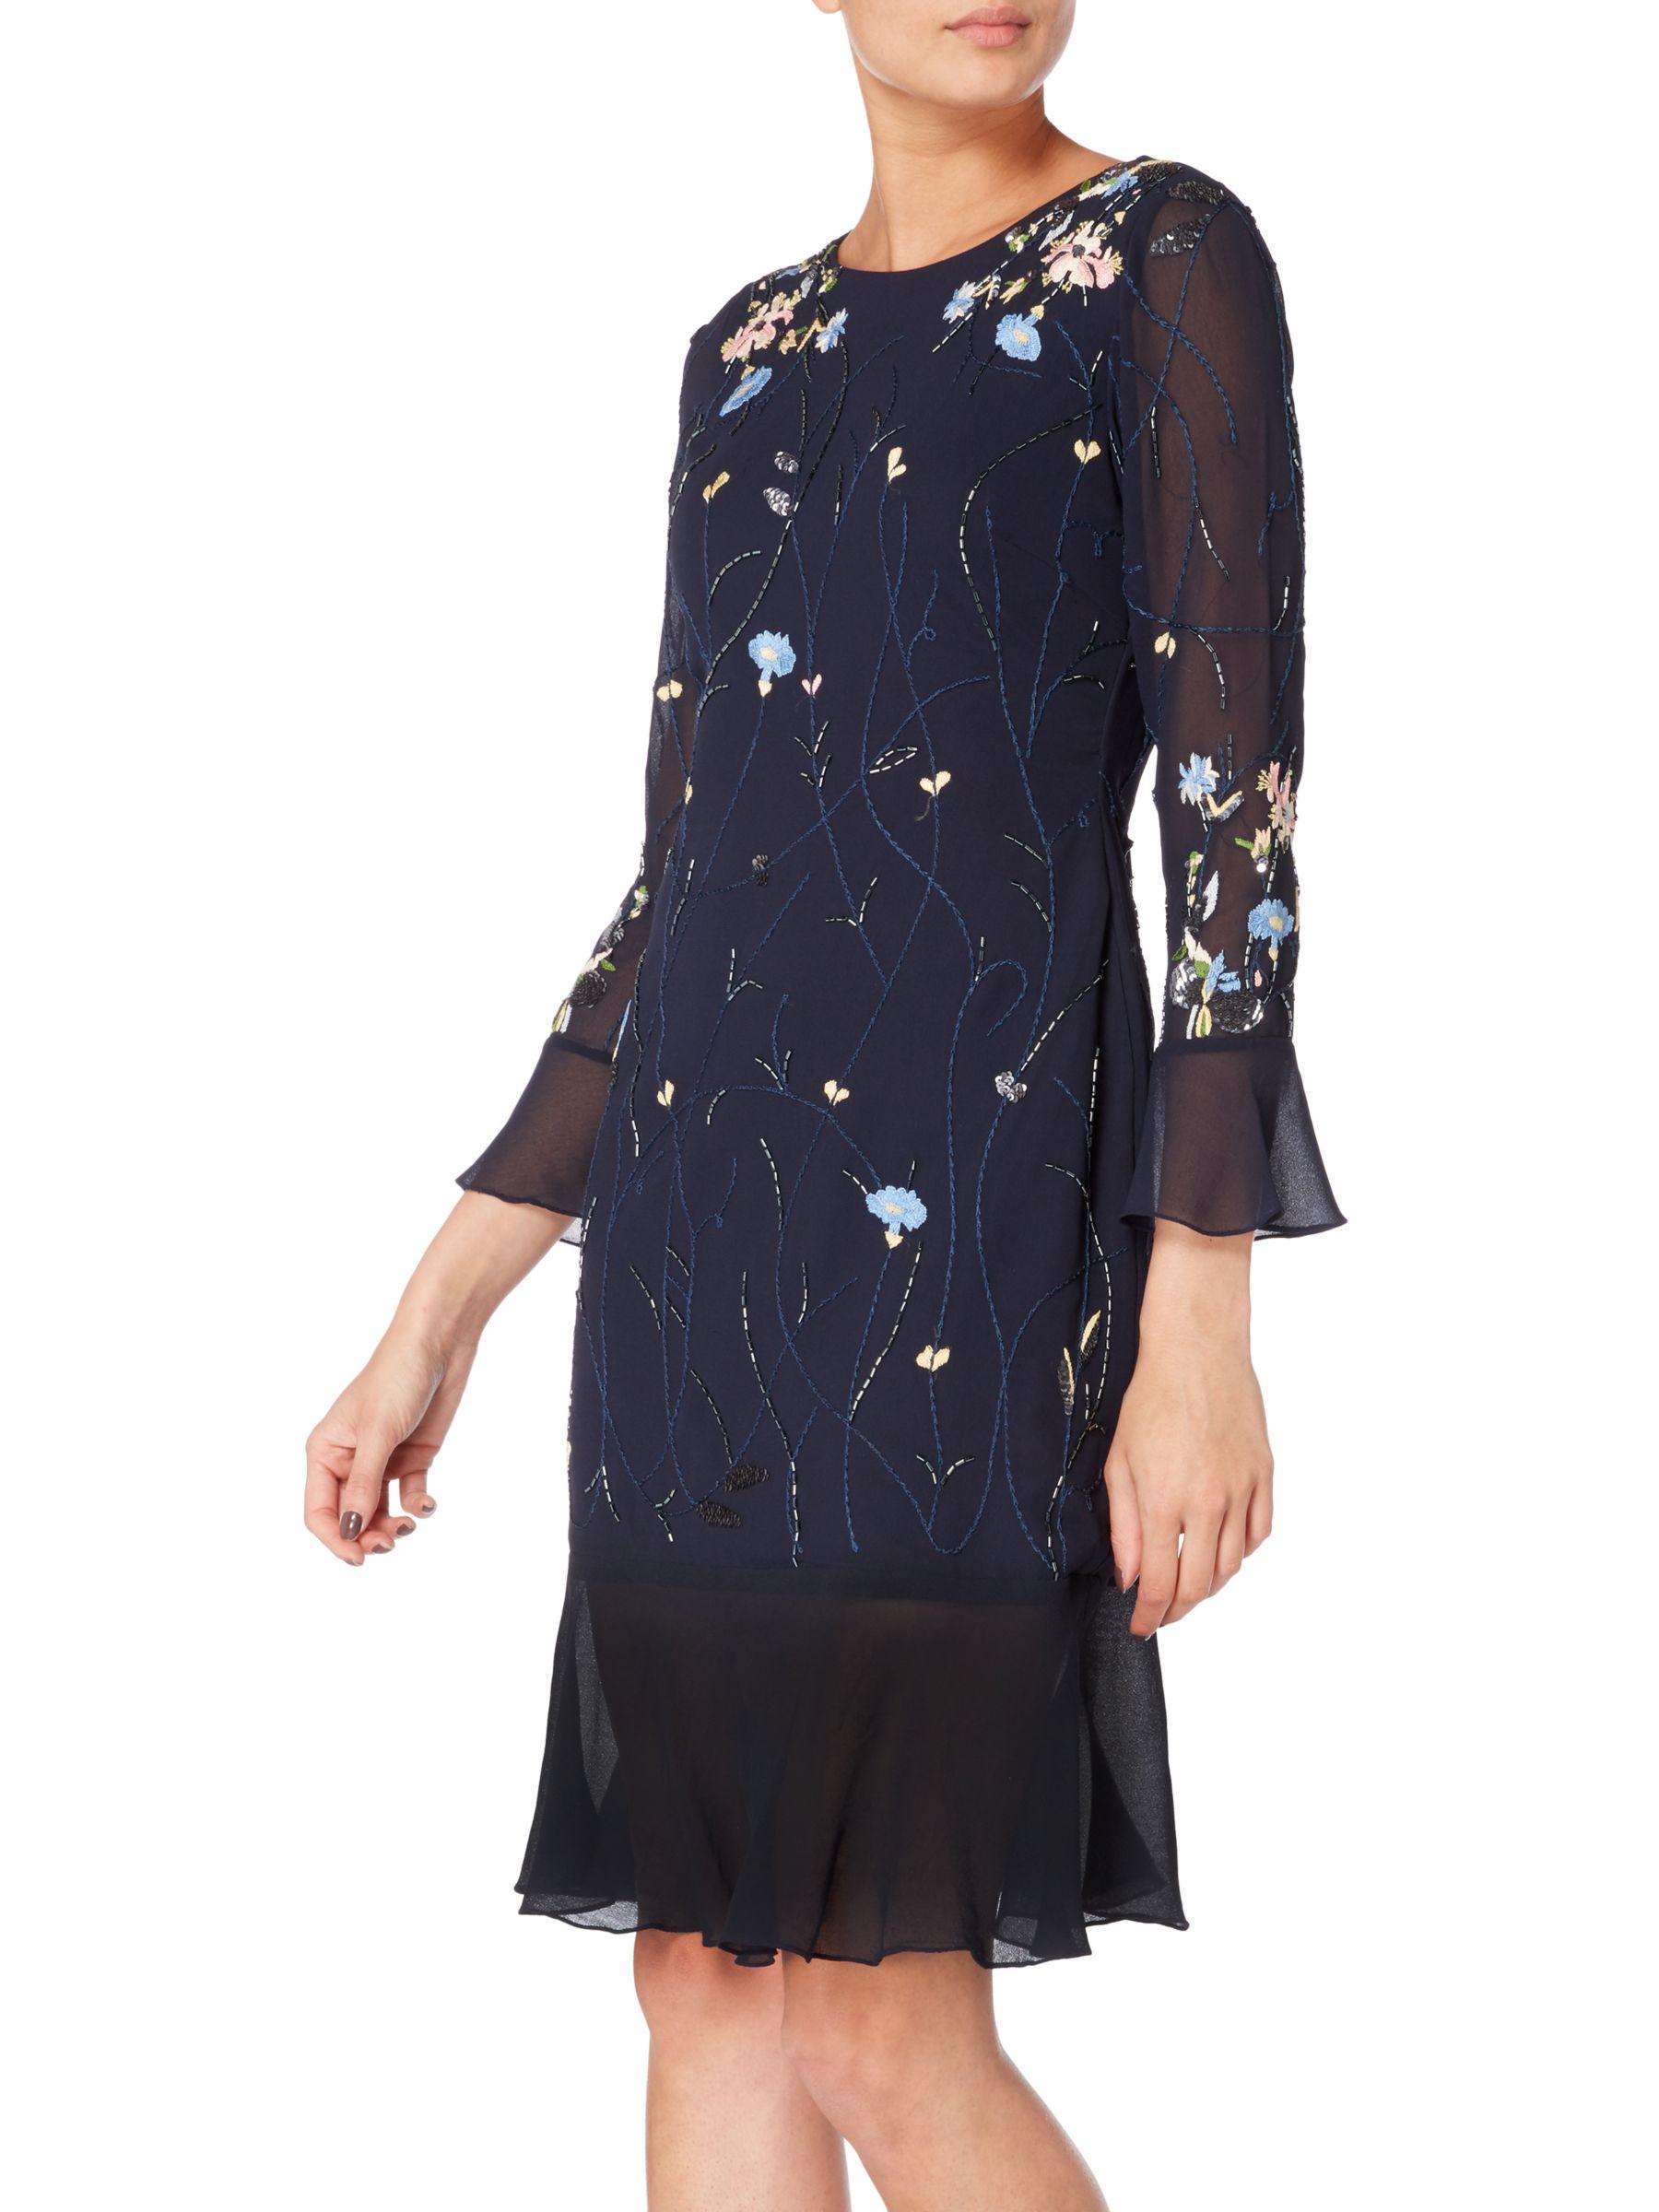 RAISHMA Raishma Embellished Floral Fluted Hem Dress, Navy